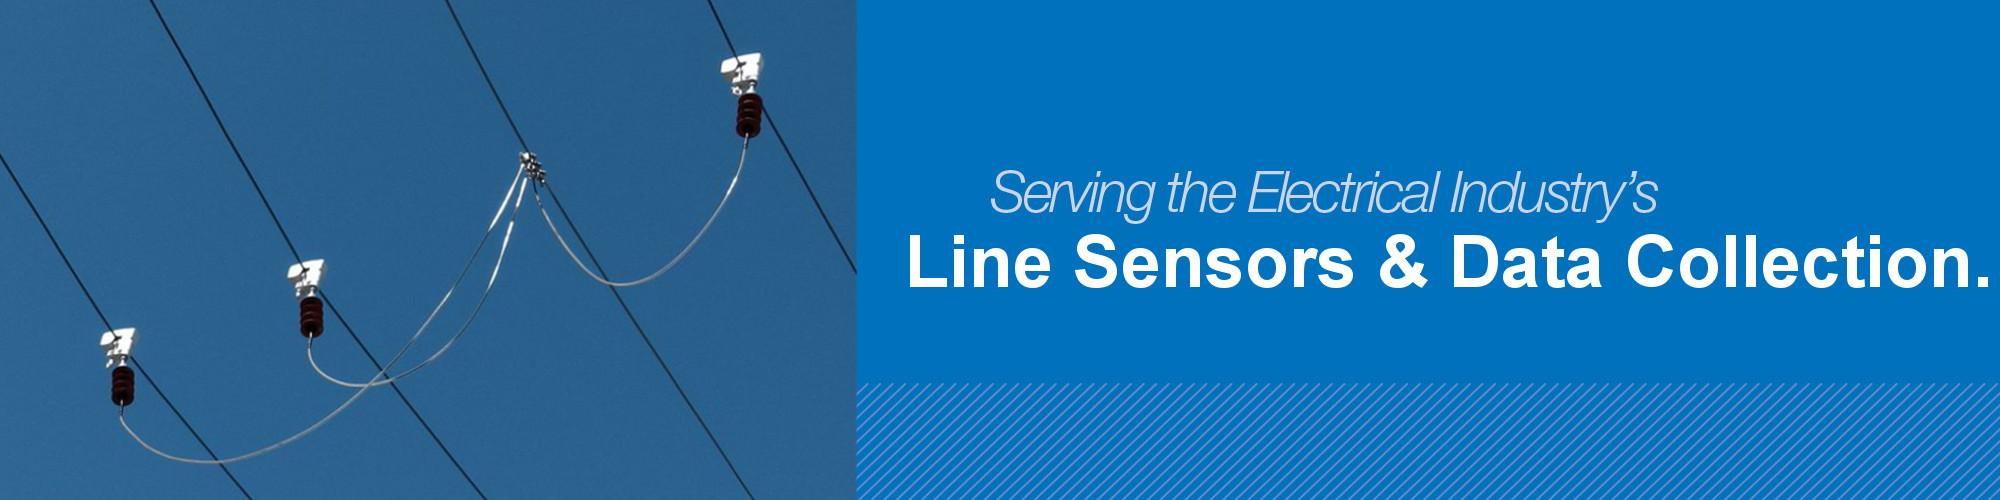 LineSensors